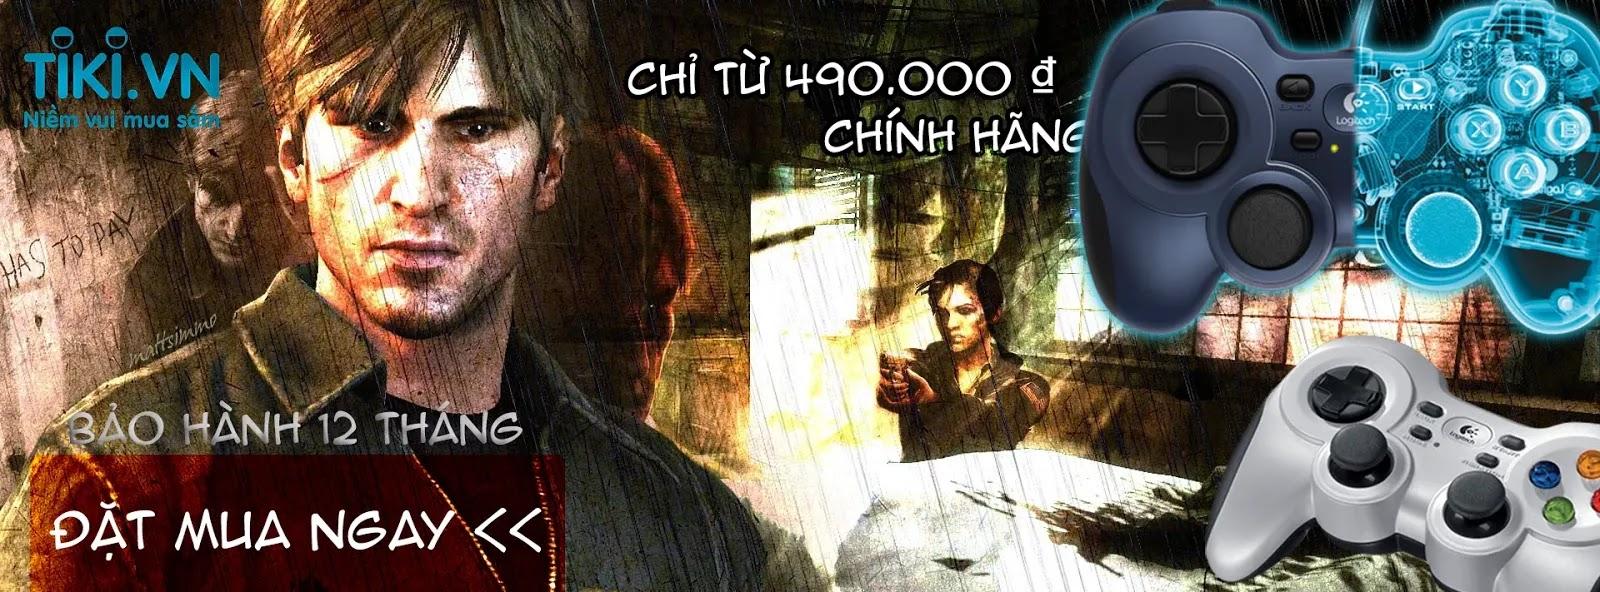 tay cam logitech AowVN.org minz - [ HOT ] Silent Hill Việt Hóa Full | Android & PC - Game Kinh Dị tuyệt hay